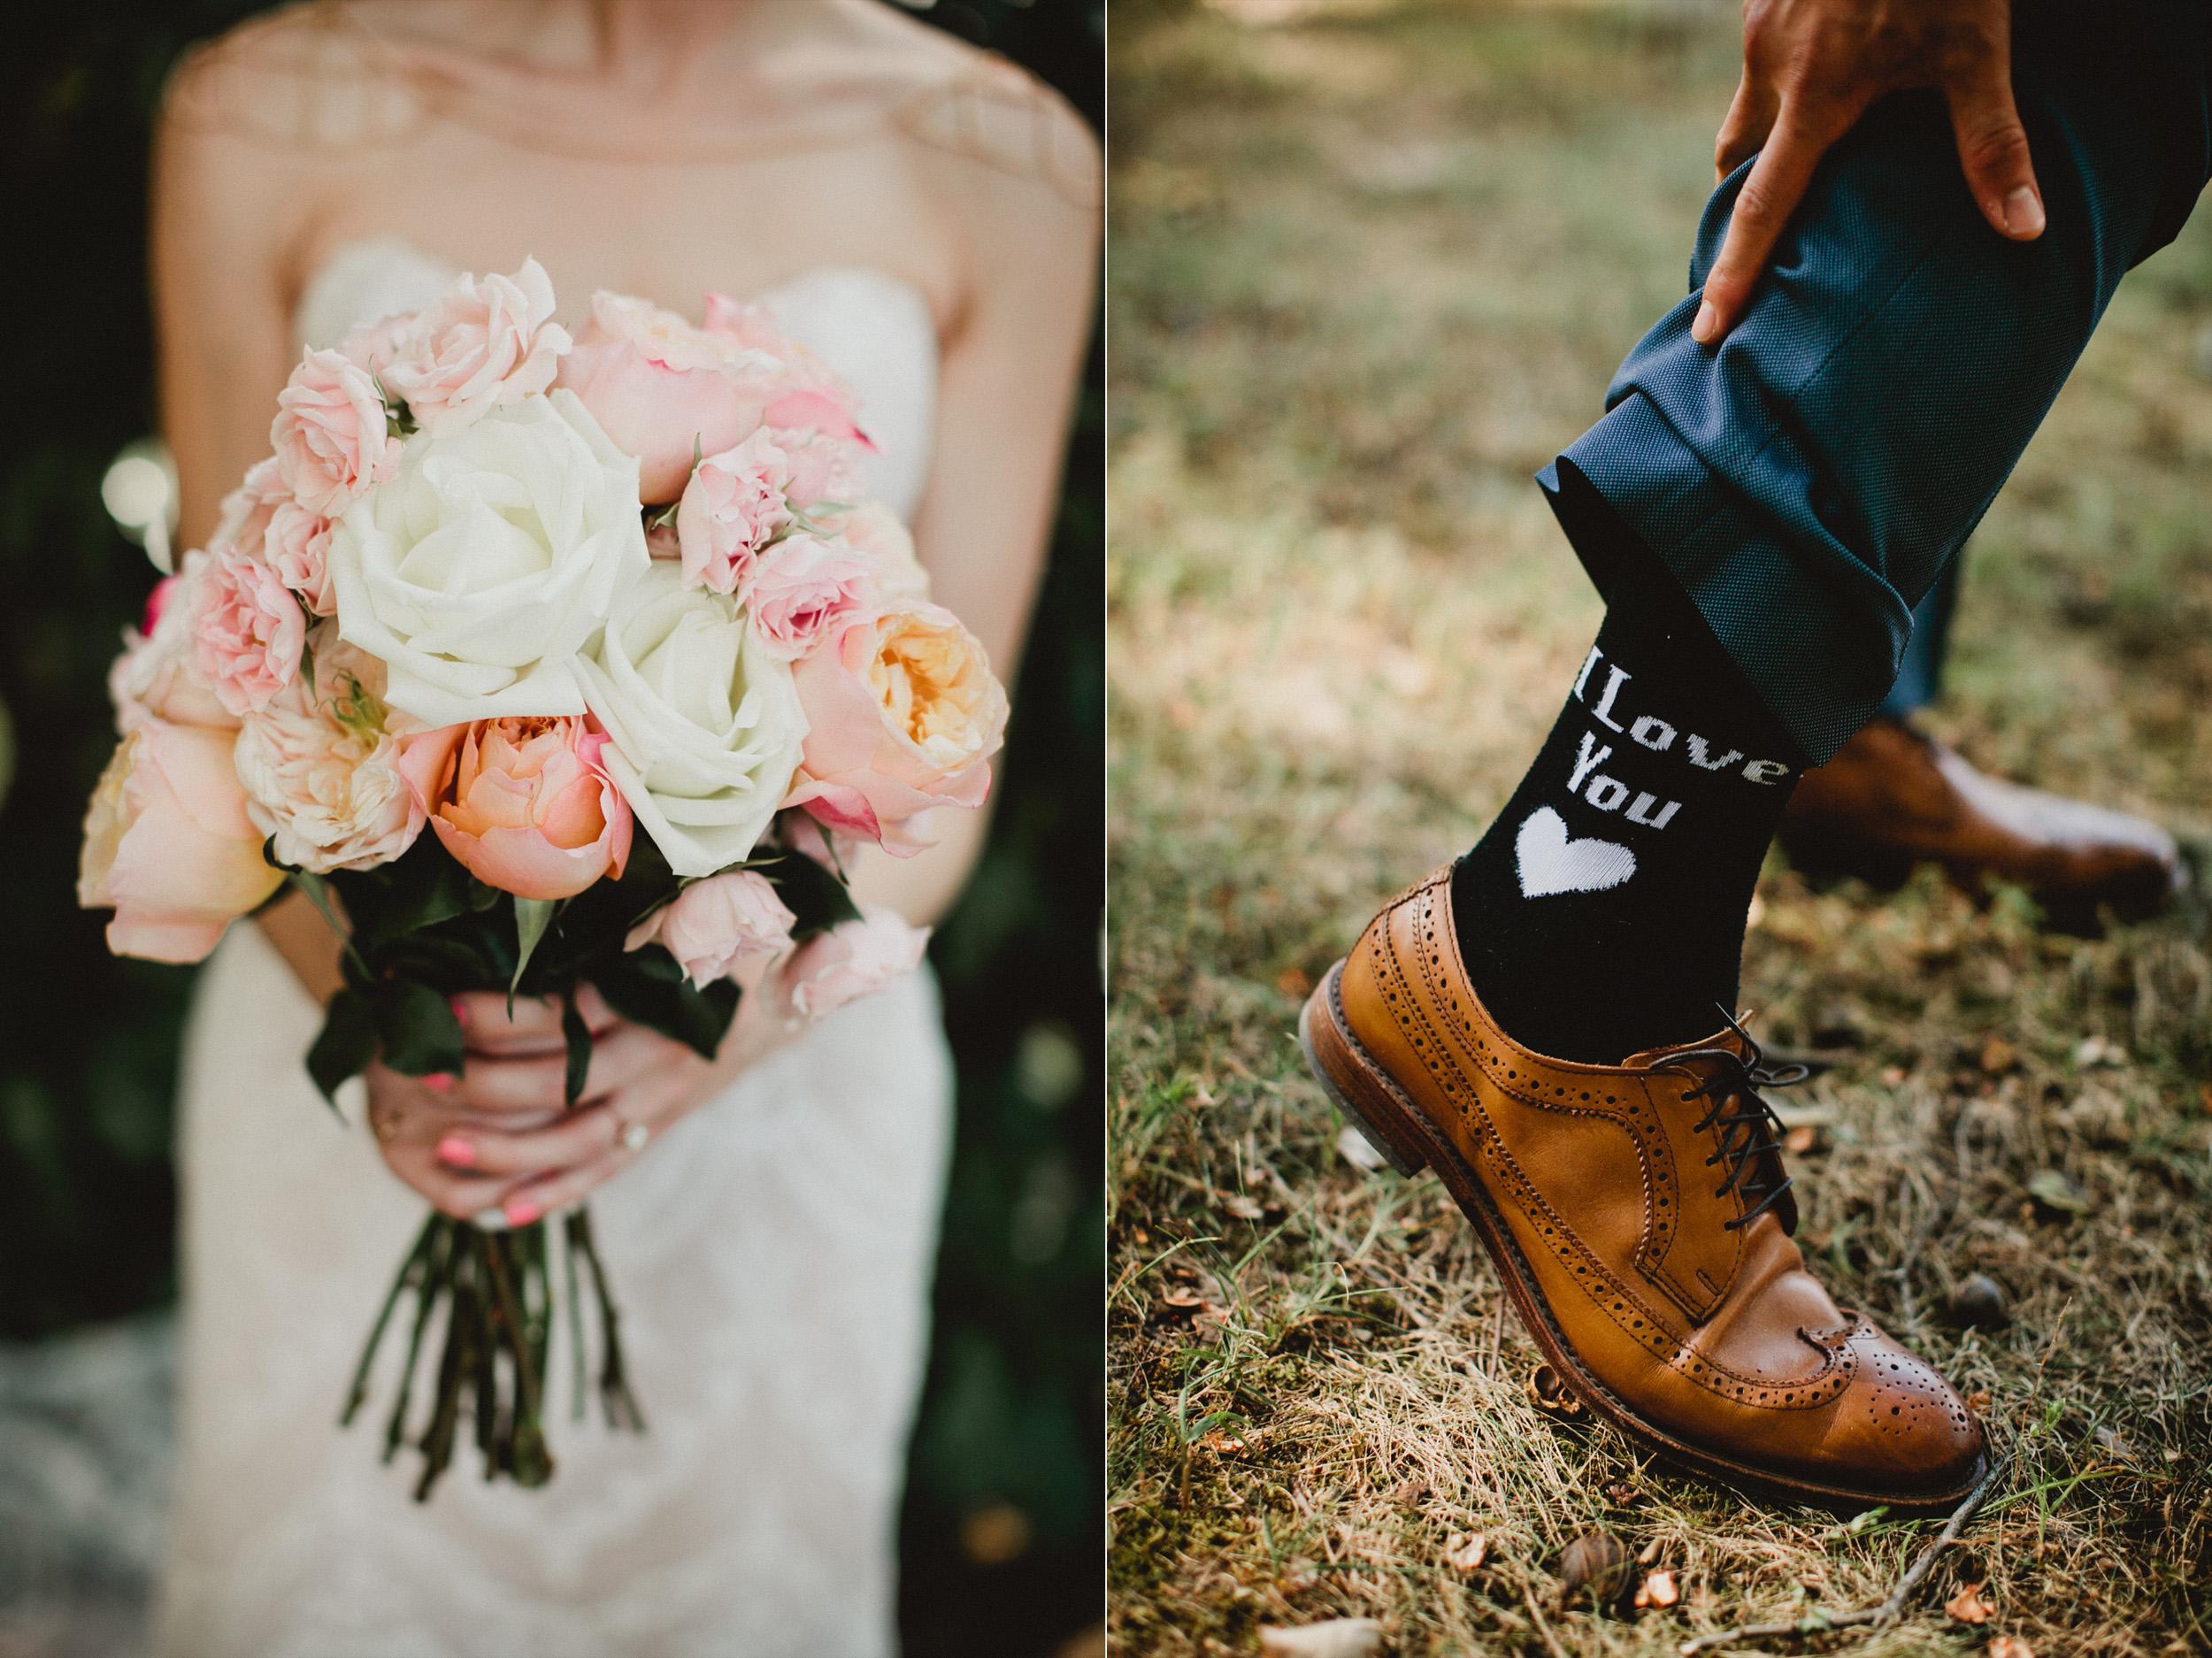 Maine-Wedding-Photographer-917e.jpg